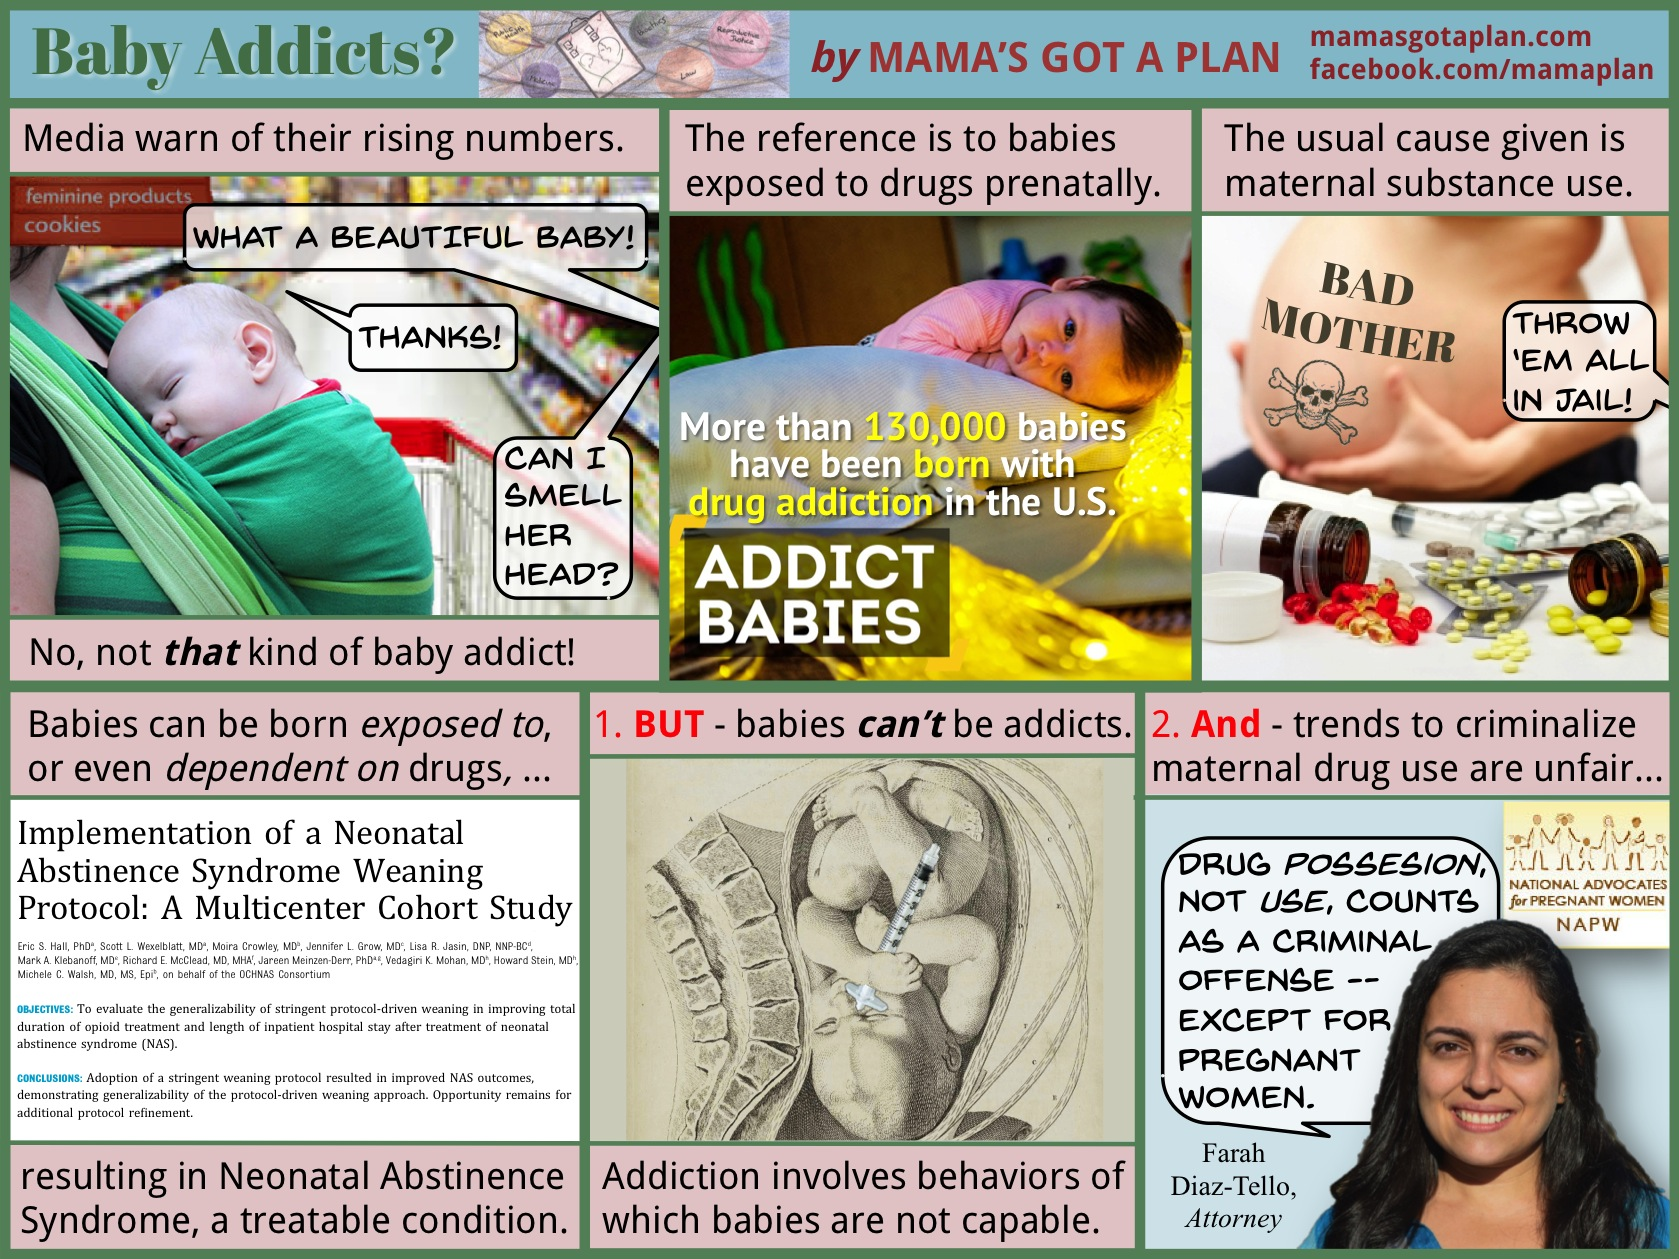 baby addicts, p1